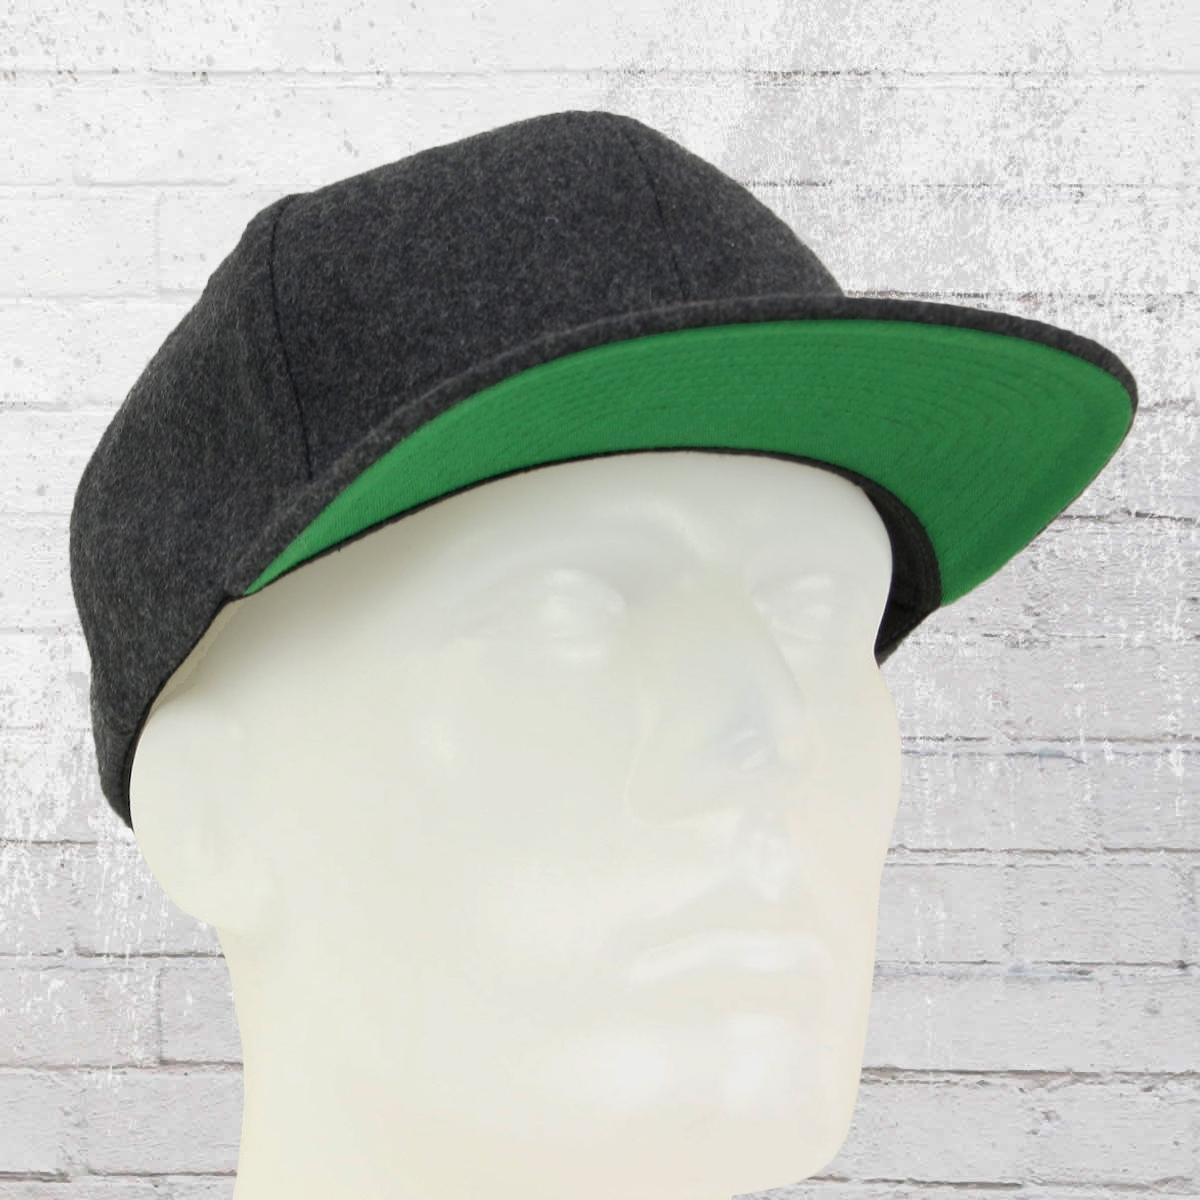 Order now | Yupoong by Flexfit Melton Wool Snapback Cap dark